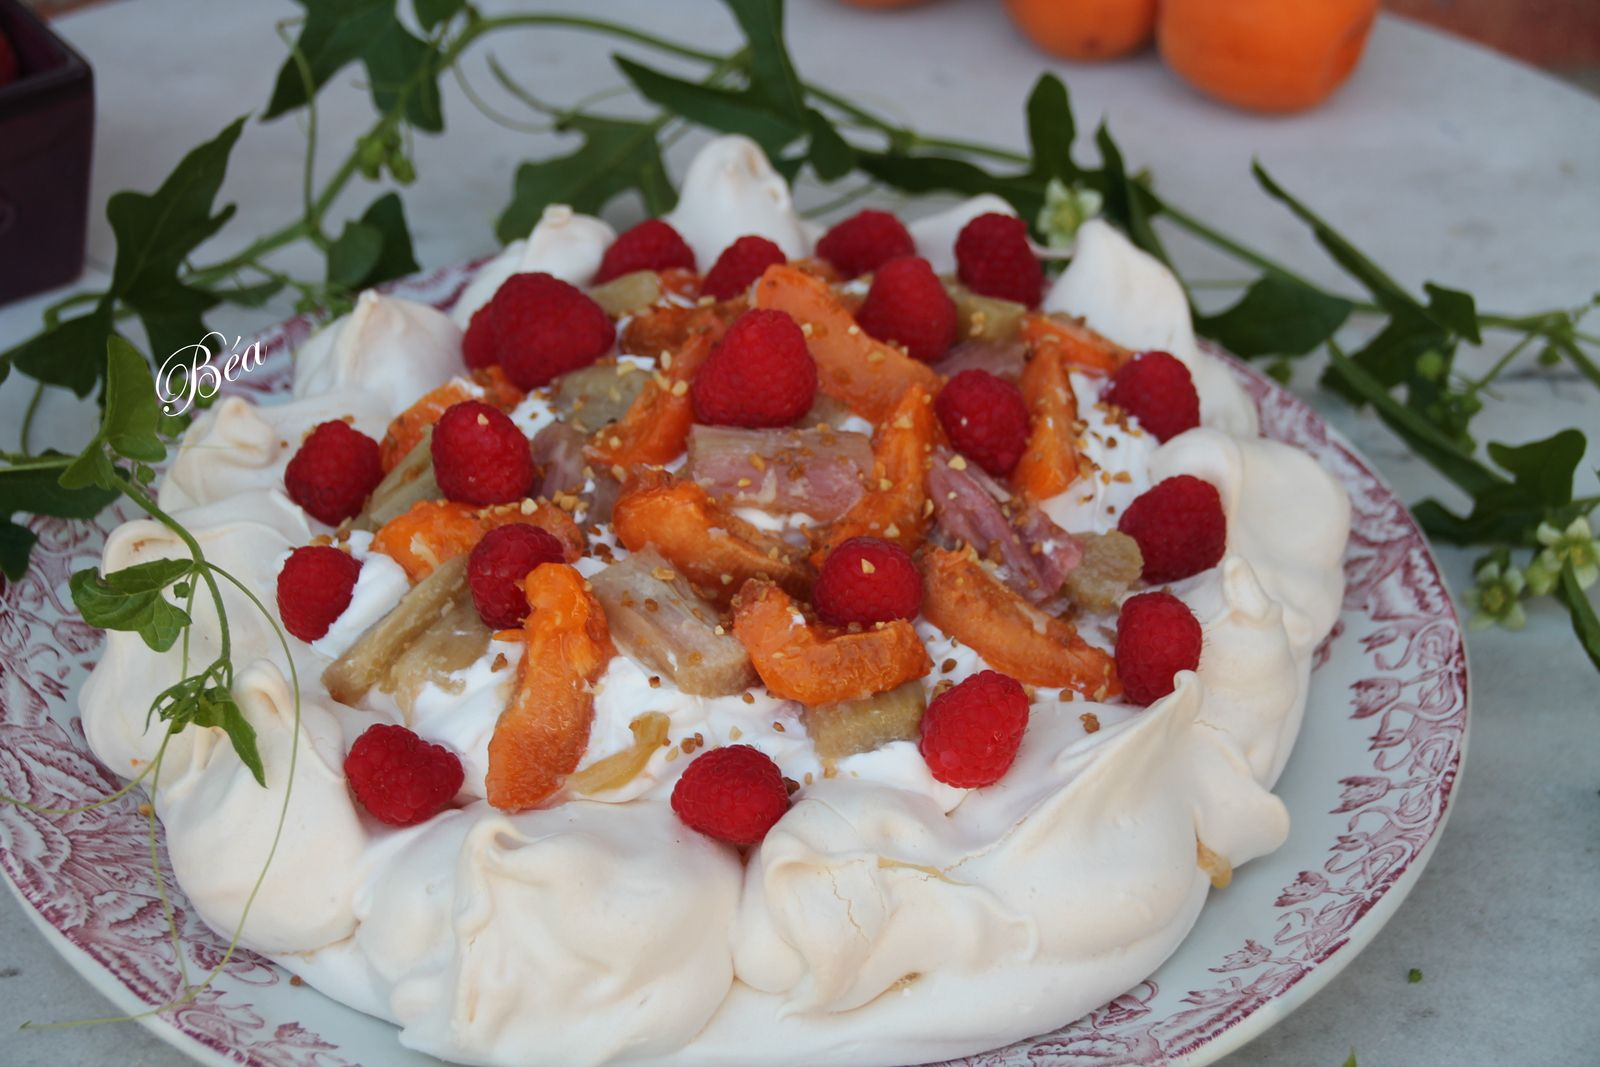 Pavlova à la rhubarbe rôtie, abricots et framboises